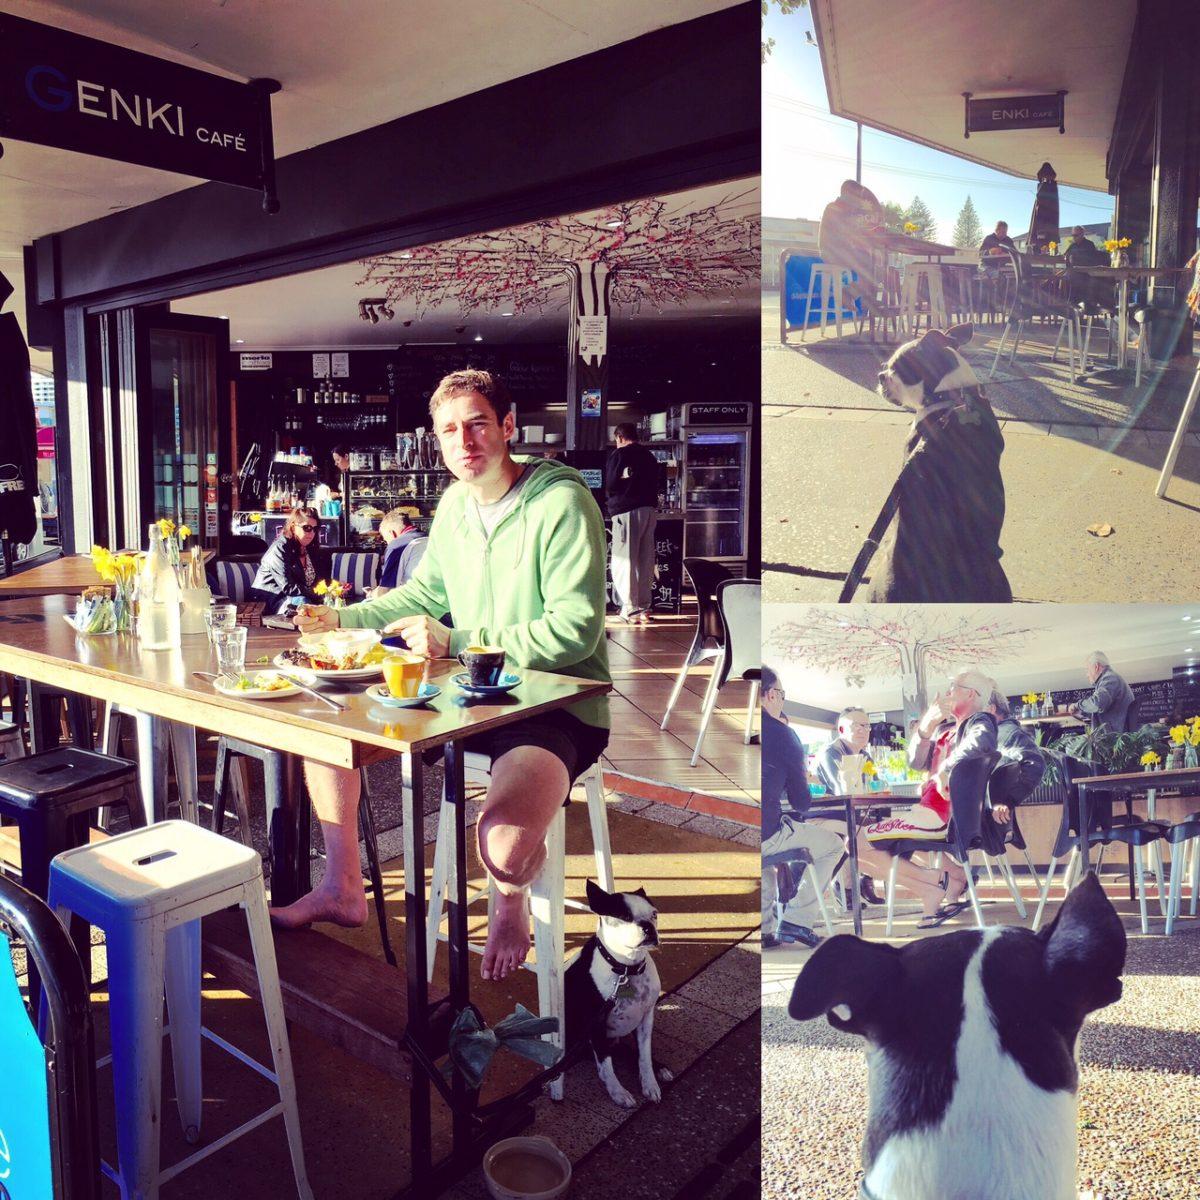 Brain's Pet Friendly Café Discovery Mission – Genki Cafe